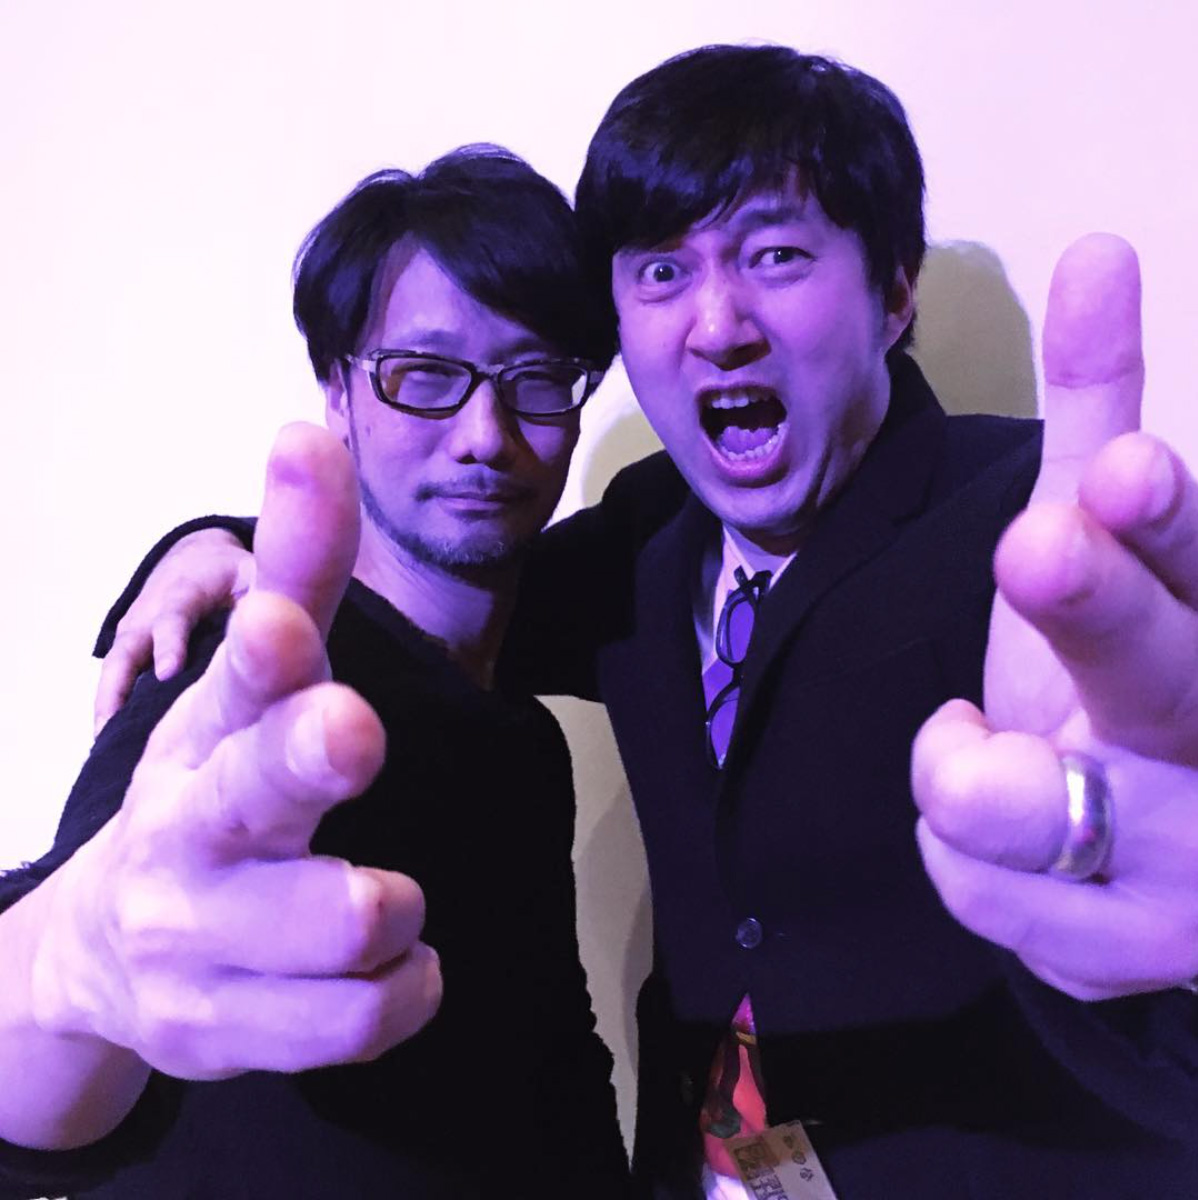 No More Heroes - Restrospective 5 - Hideo Kojima et Suda 51